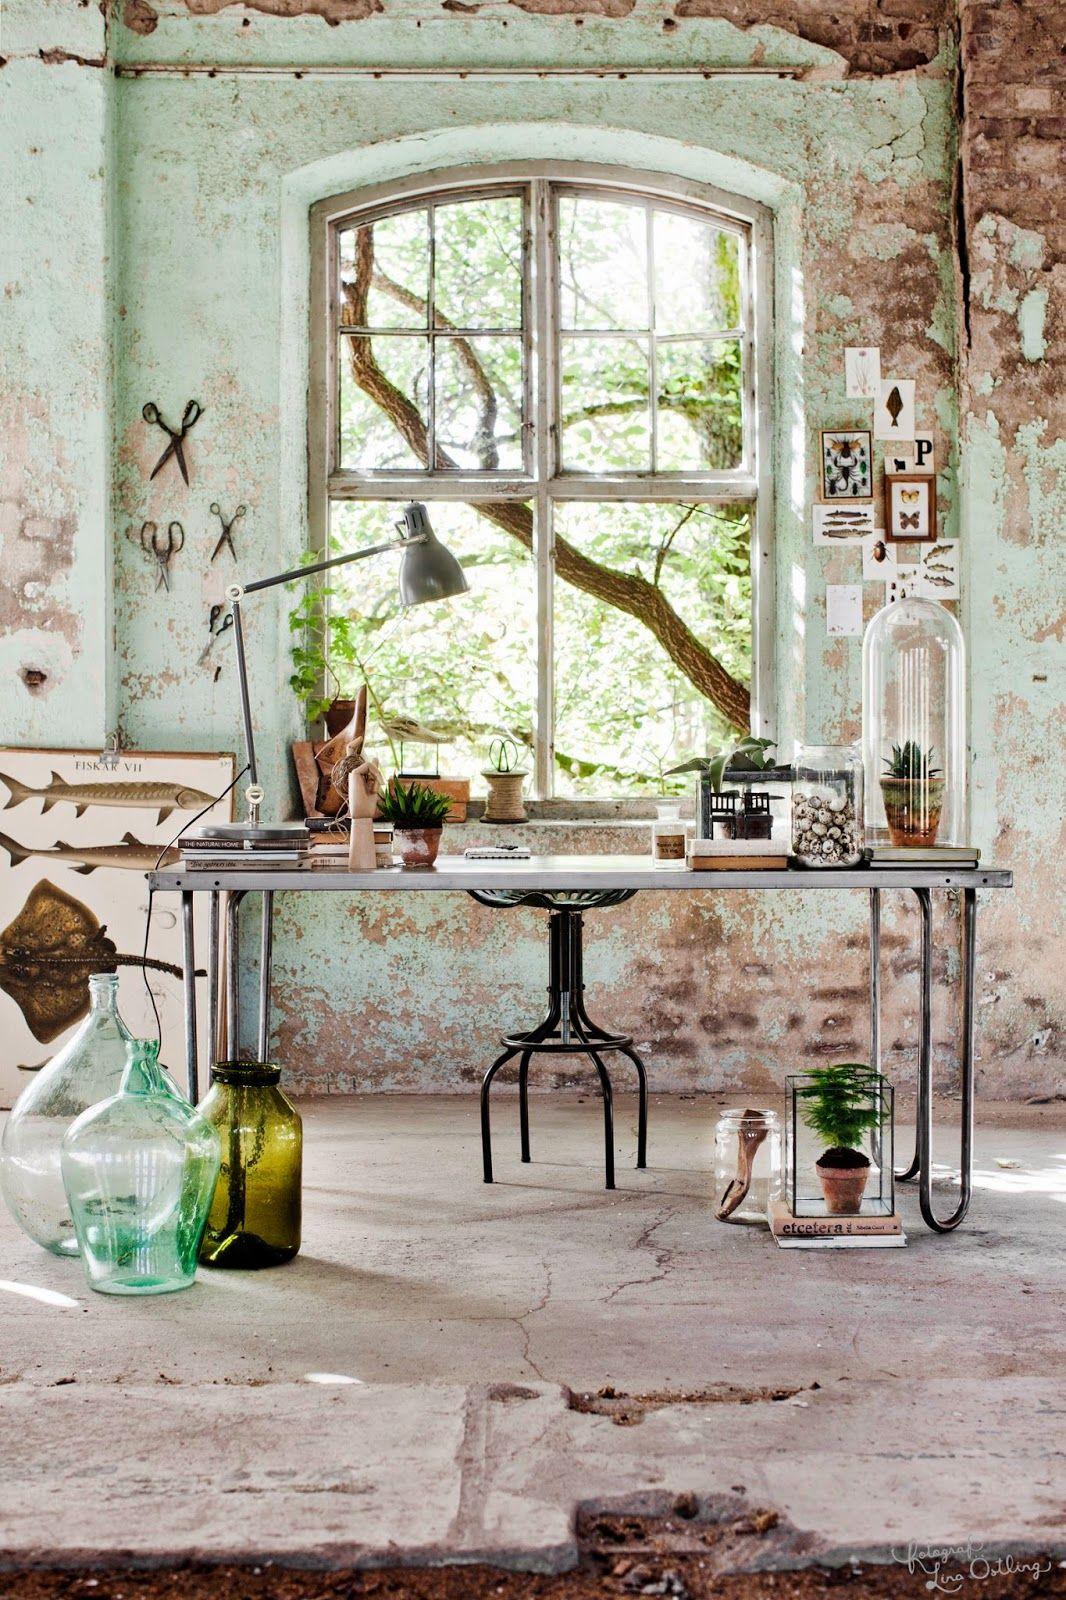 Get Inspired By This Vintage Decor Ideas Vintagedecor Vintageindustrialstyle Vintagehomeideas Http Vintageindustria Decor Rustic Interiors House Interior